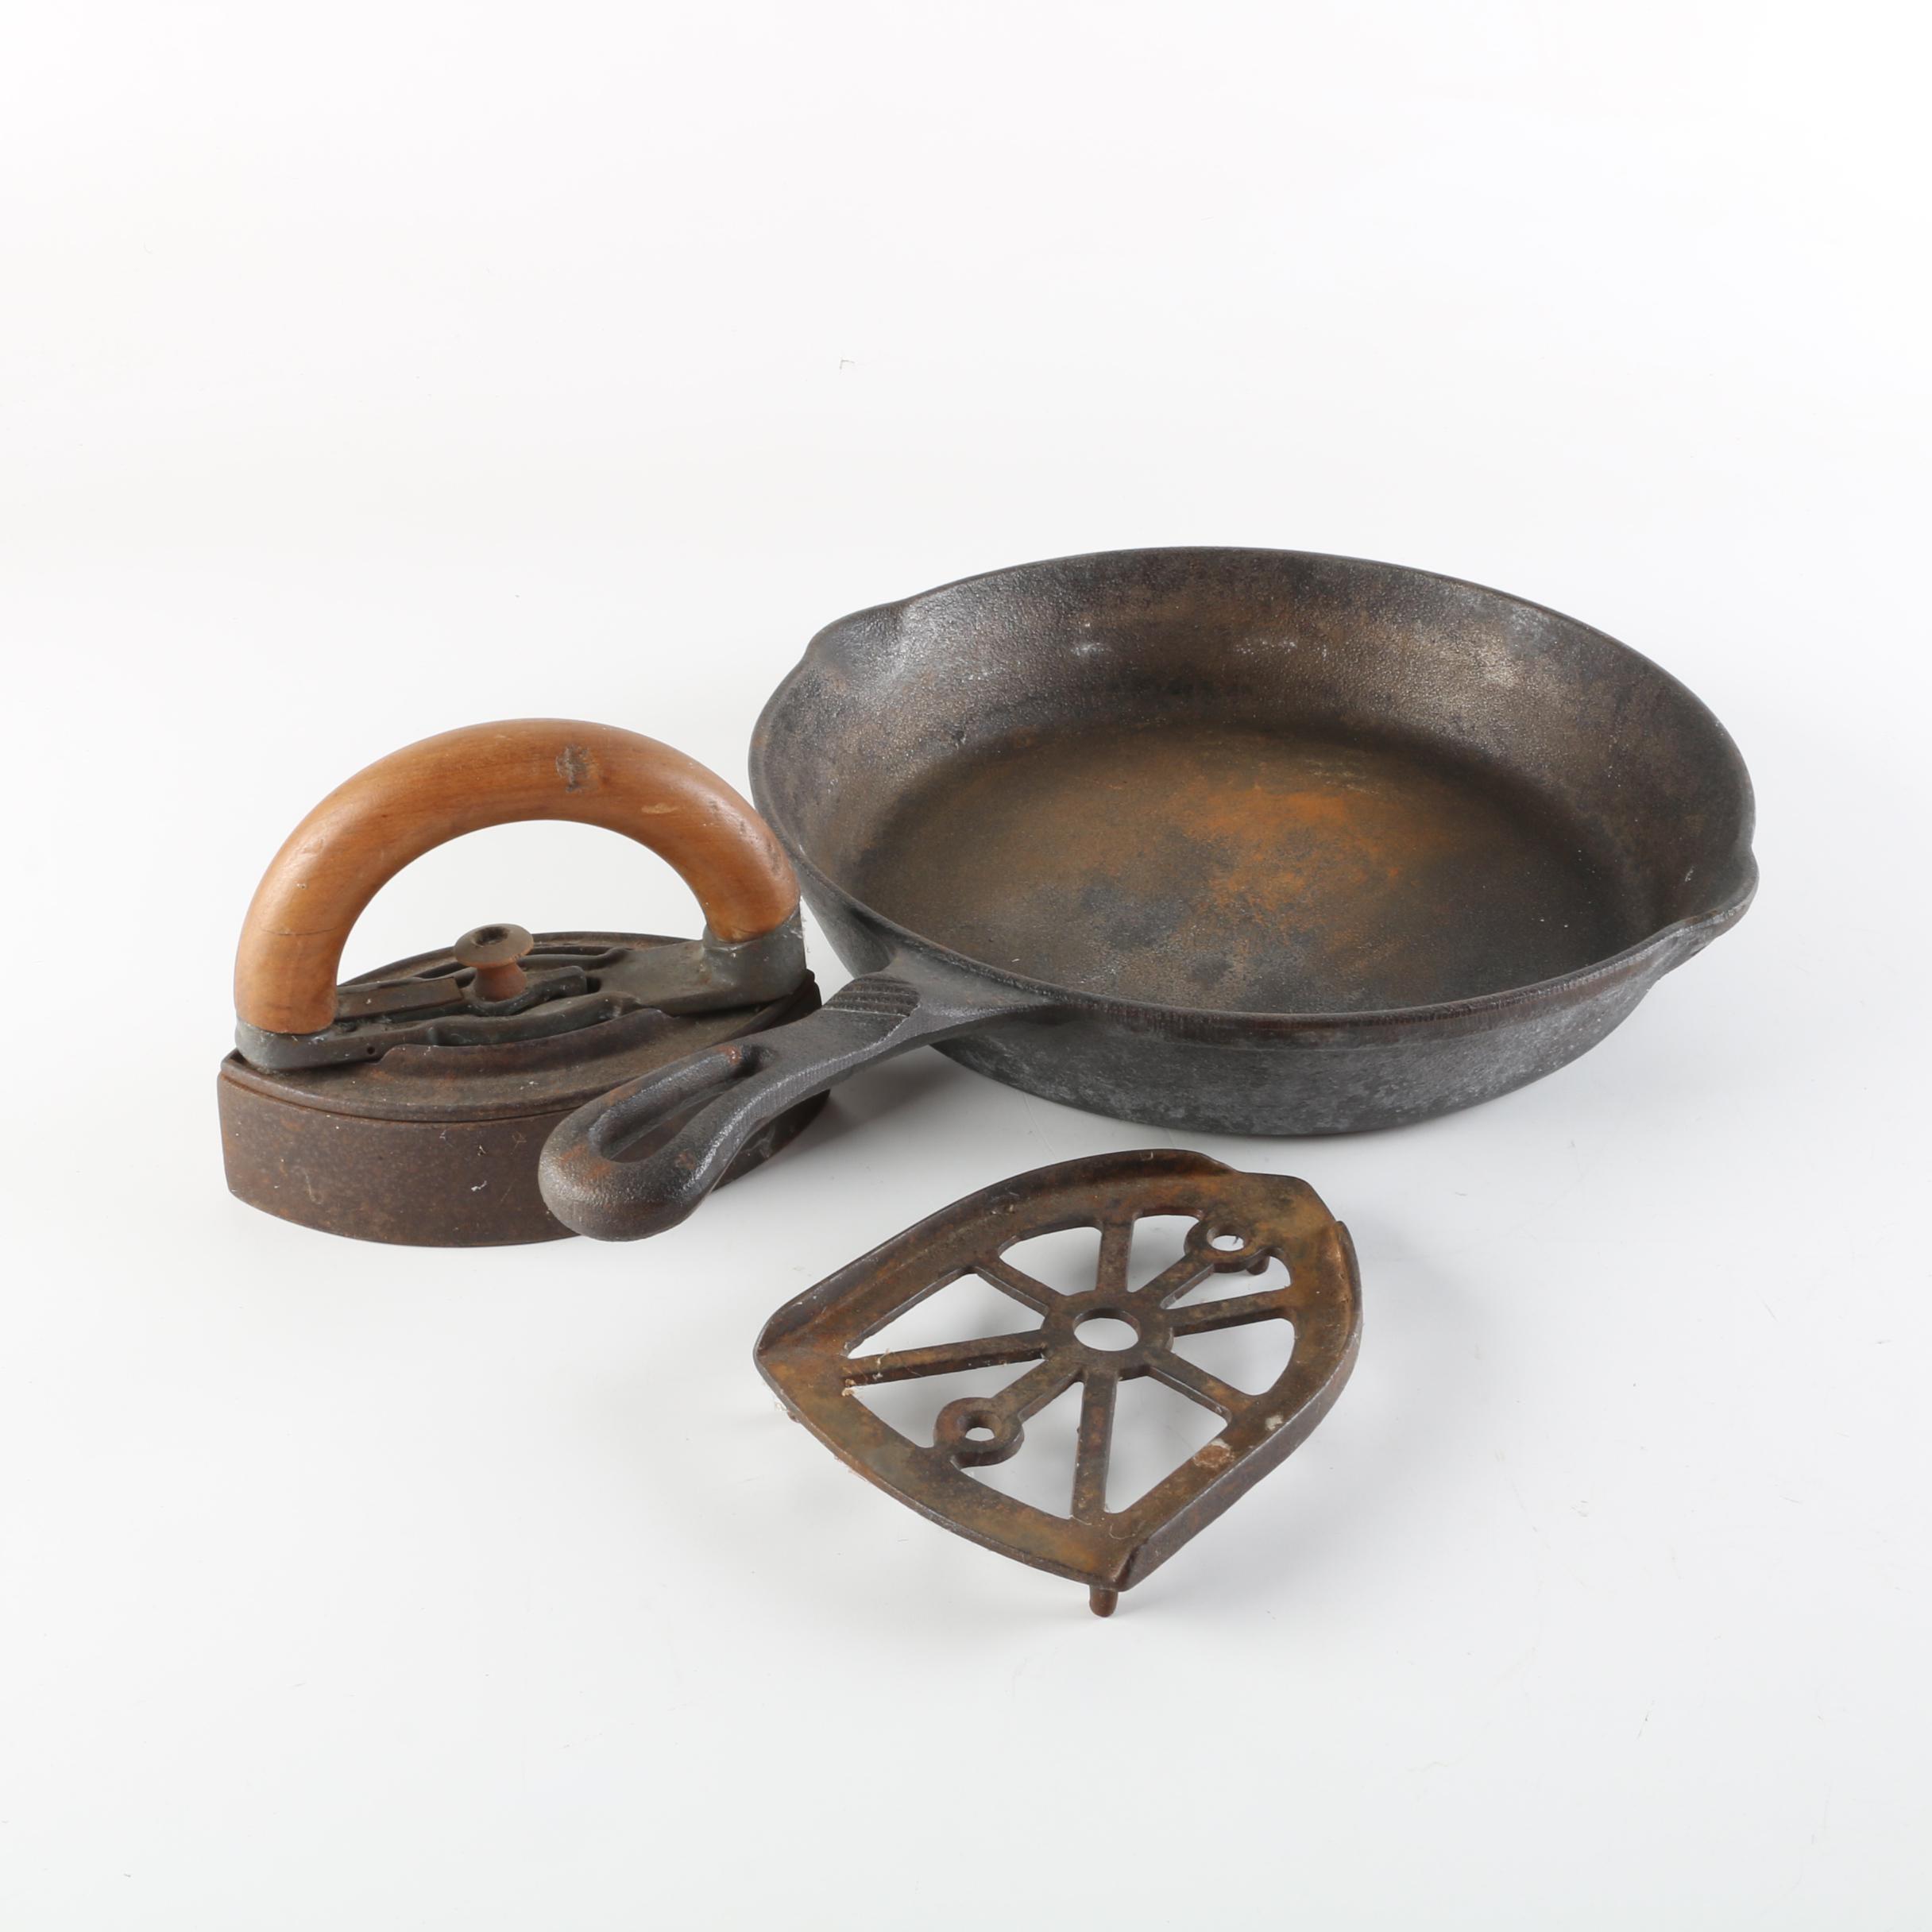 Keilen Cast Iron Skillet Including Vintage Iron and Trivet